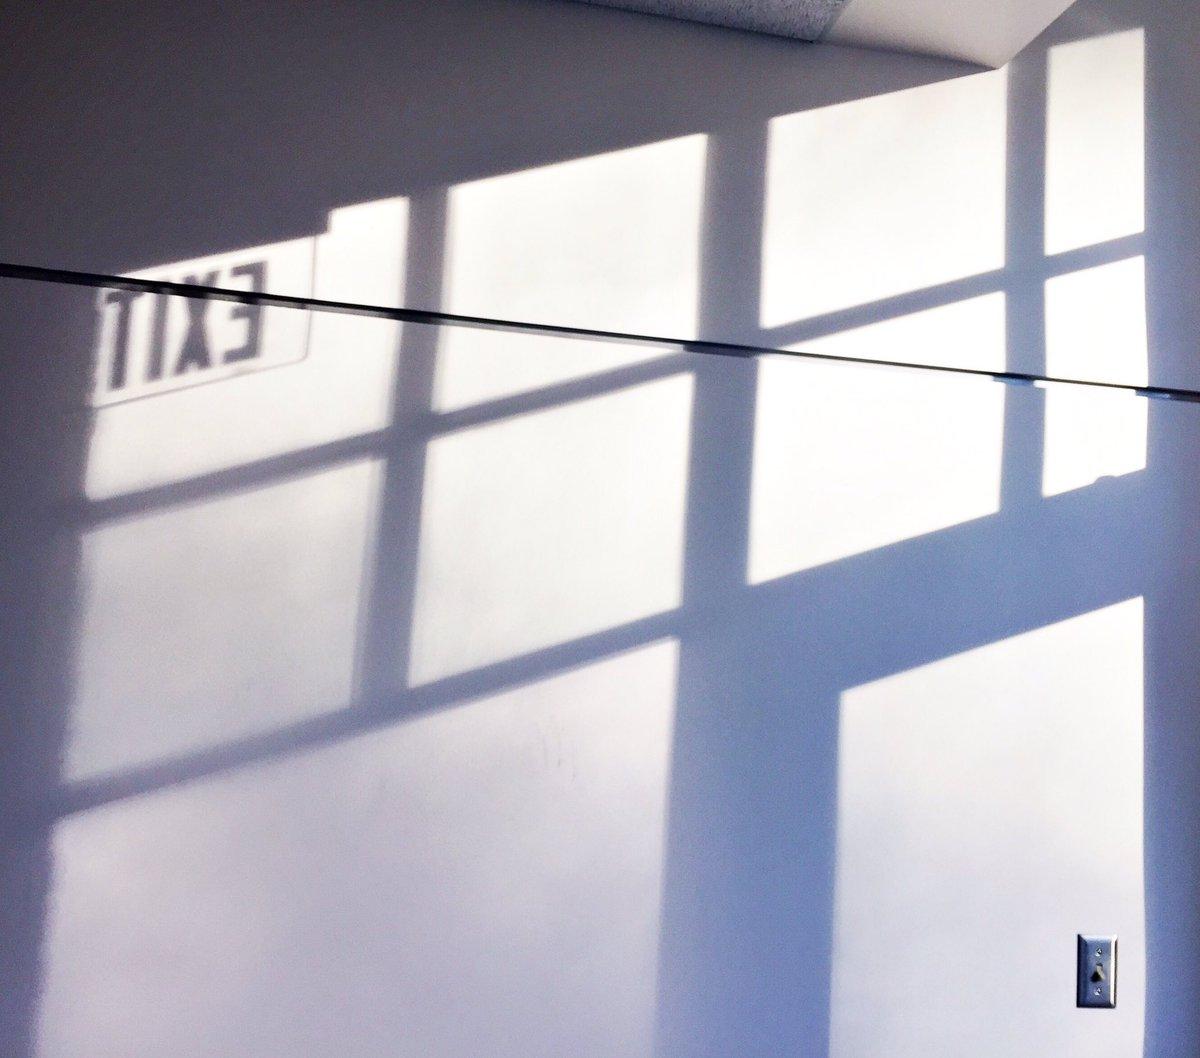 My favorite hallway @CushingAcademy Visual Arts Bldg #beautifullight #windowlight #availablelight #shadows #availablelightphoto #exitpic.twitter.com/JKGuLRON7e